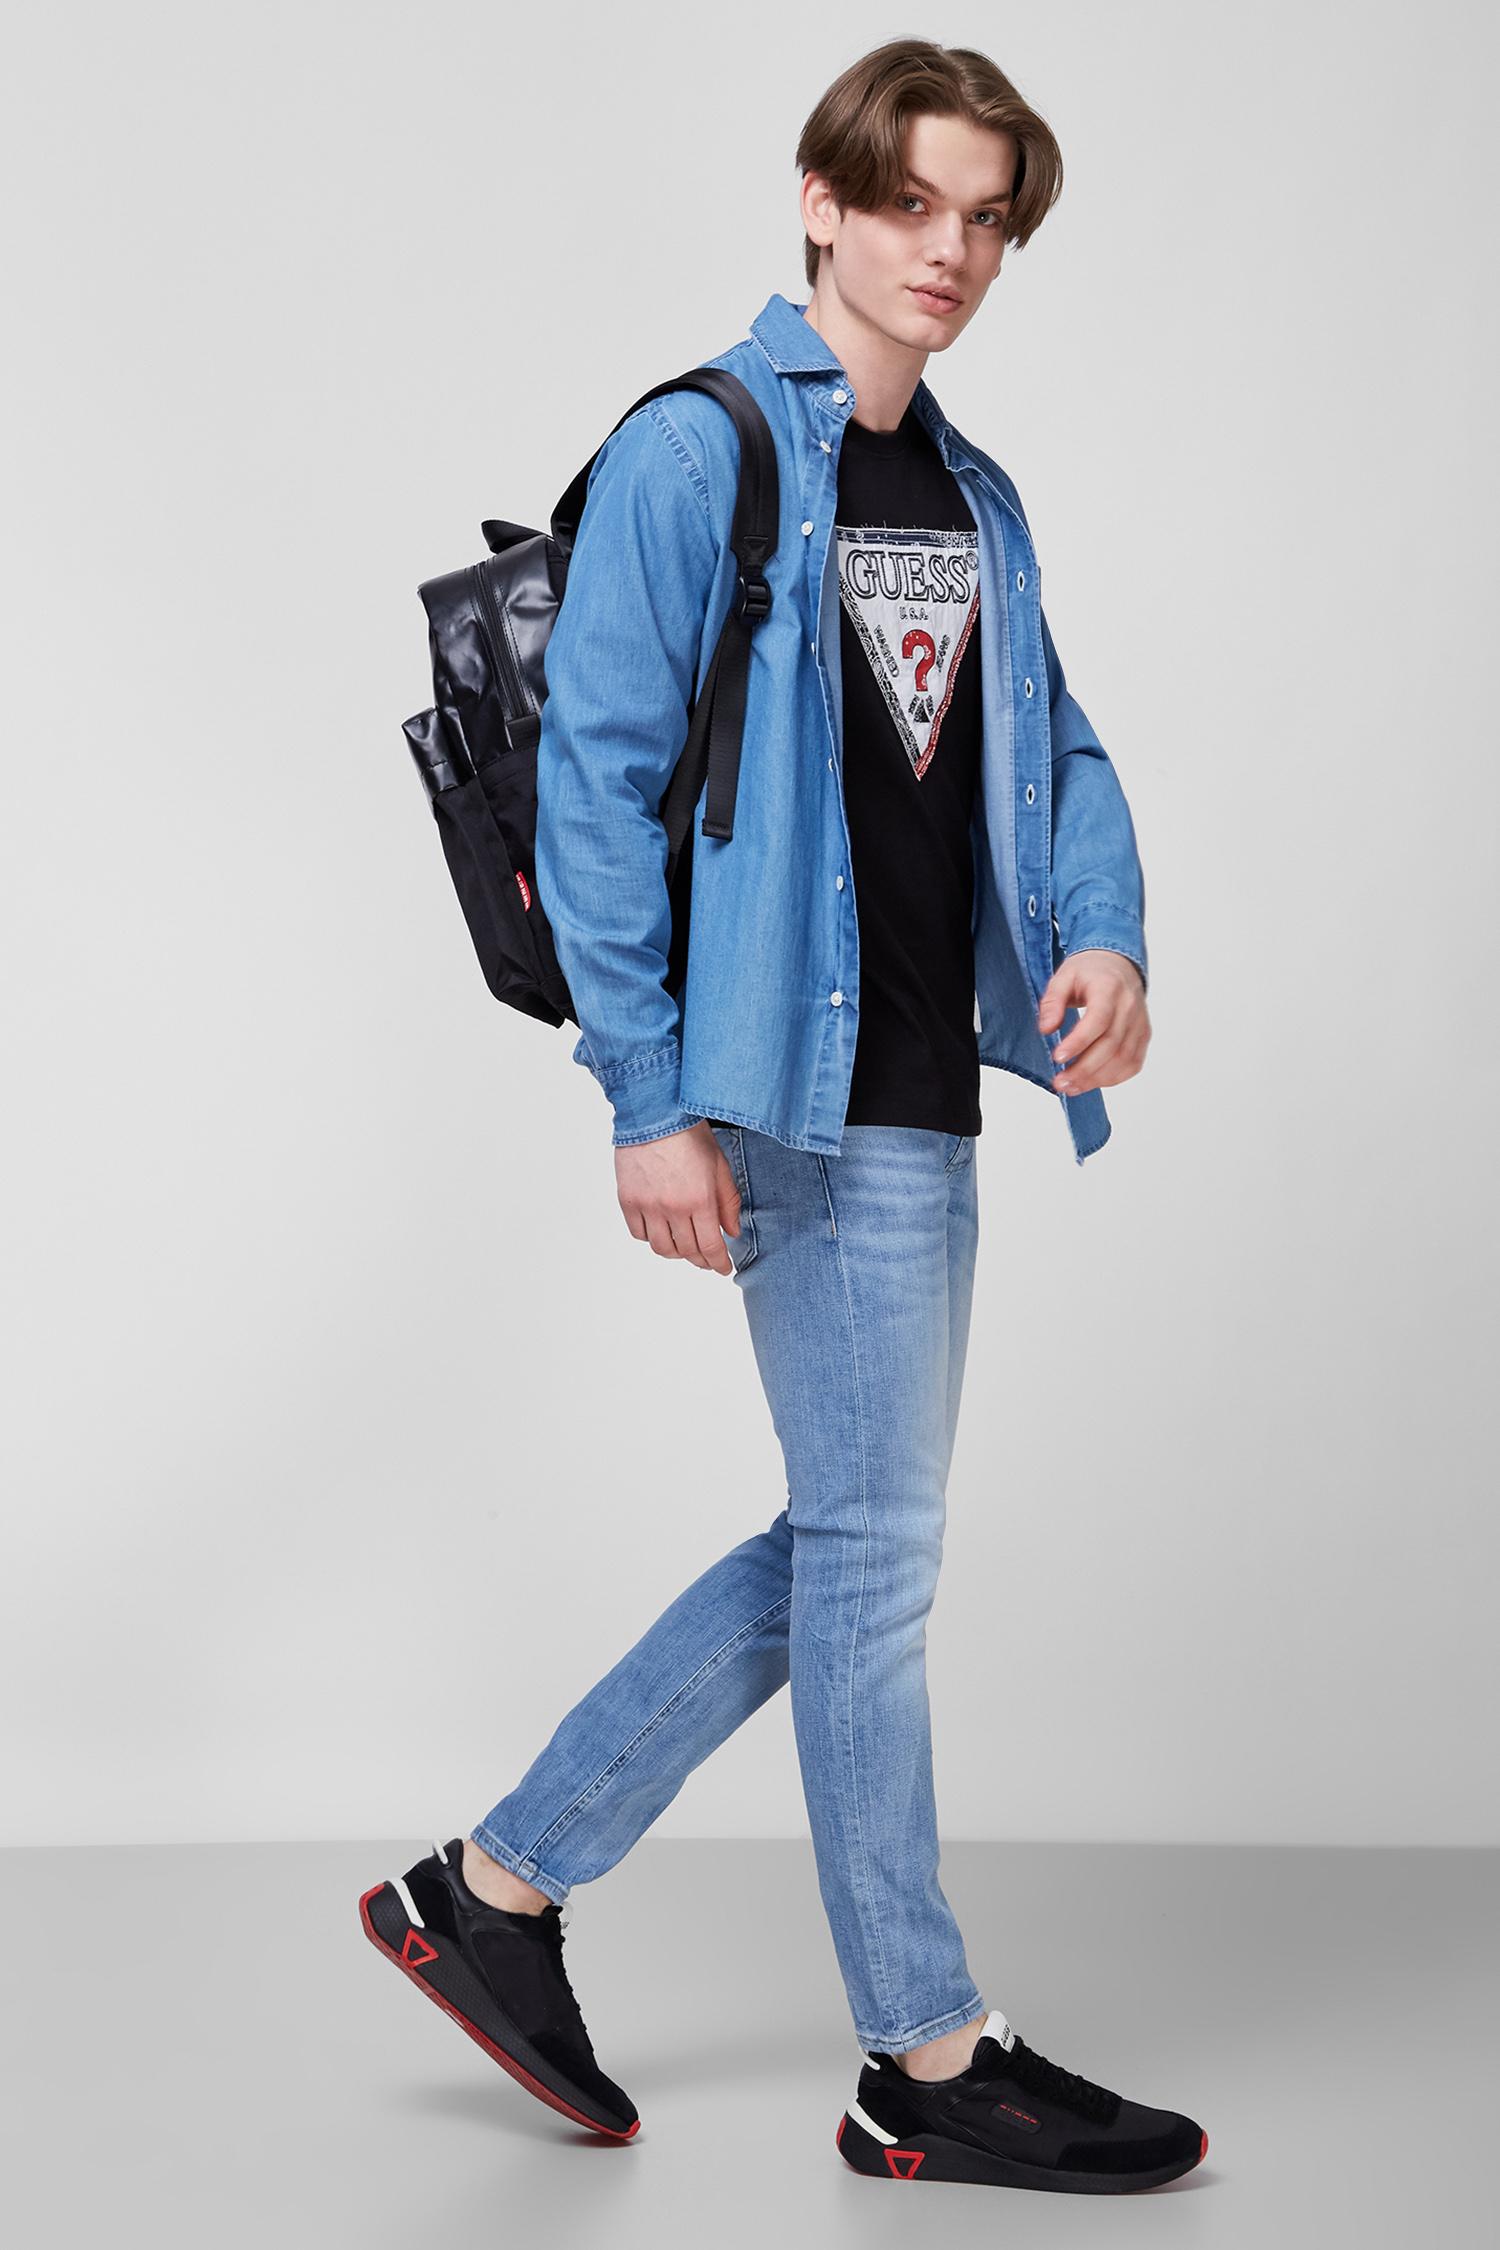 Голубая джинсовая рубашка для парней Guess M1GH54.D4DW1;JEWE